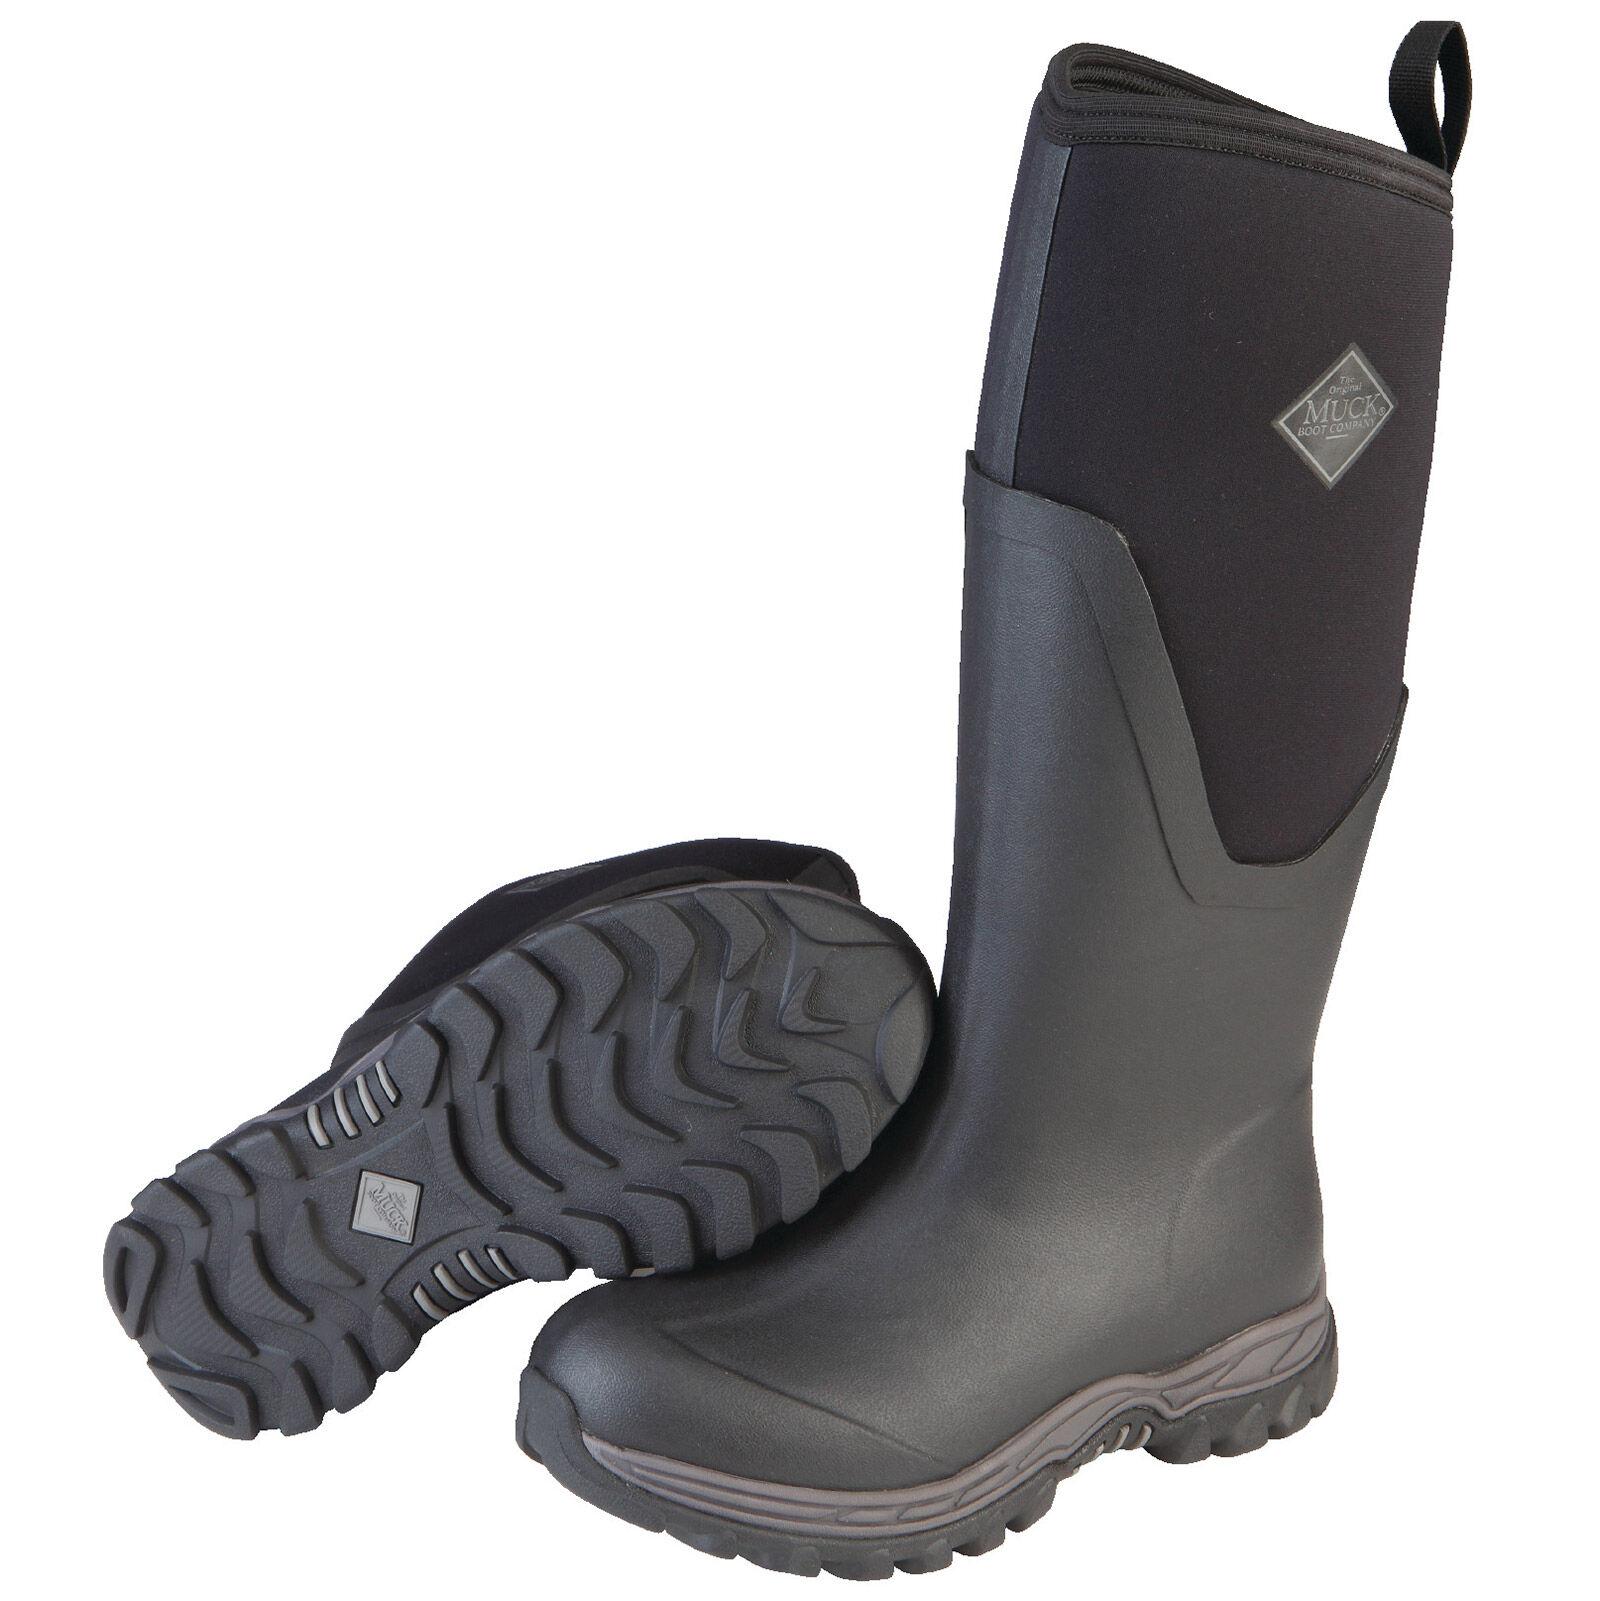 Bottes Muck Boot Arctic Sport II, femme